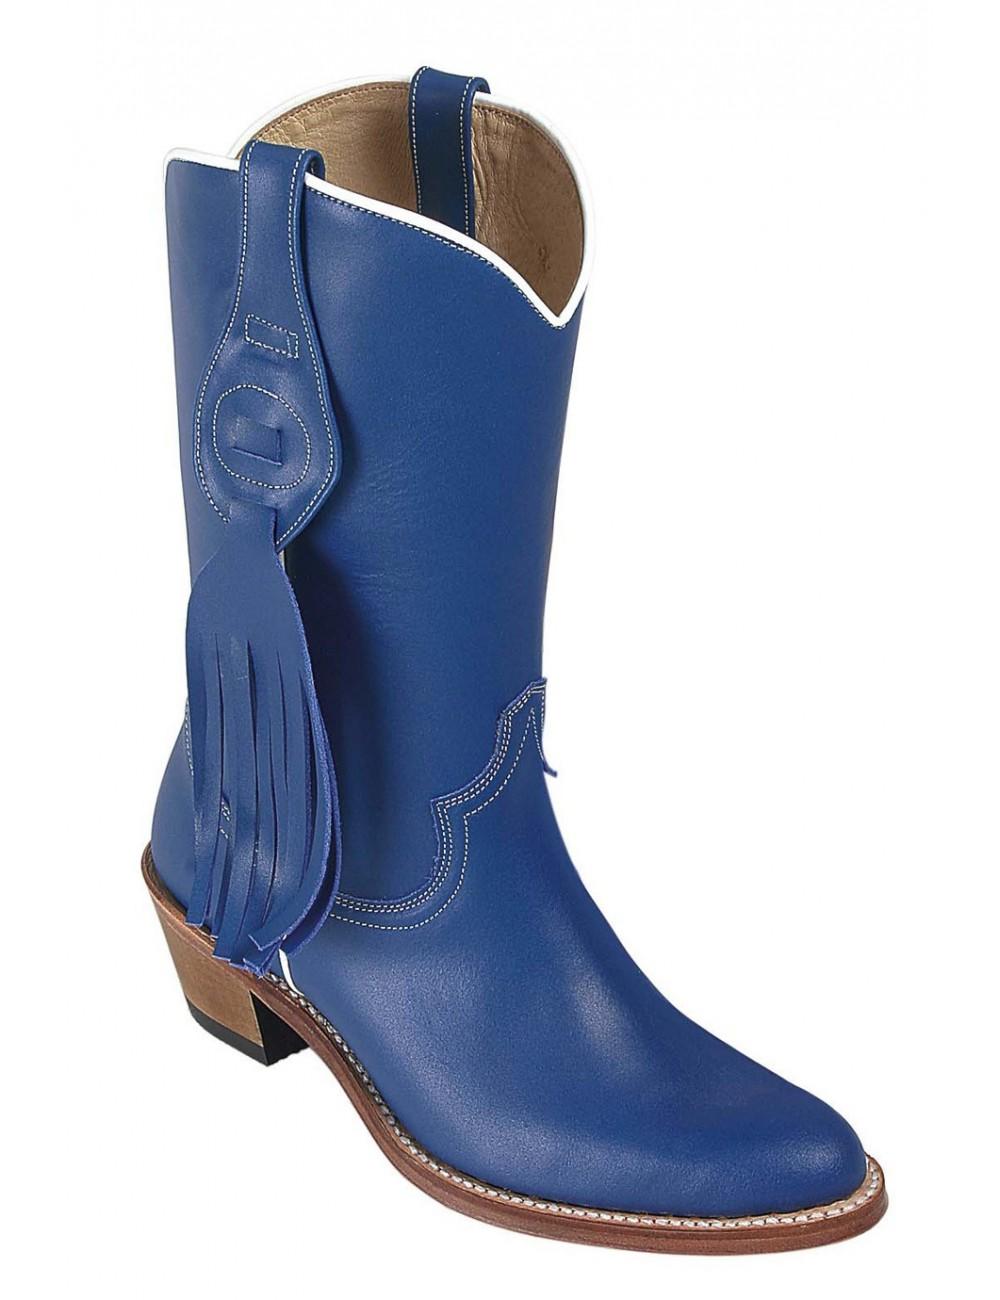 Bottes santiag country - Bottes country cuir bleu femme